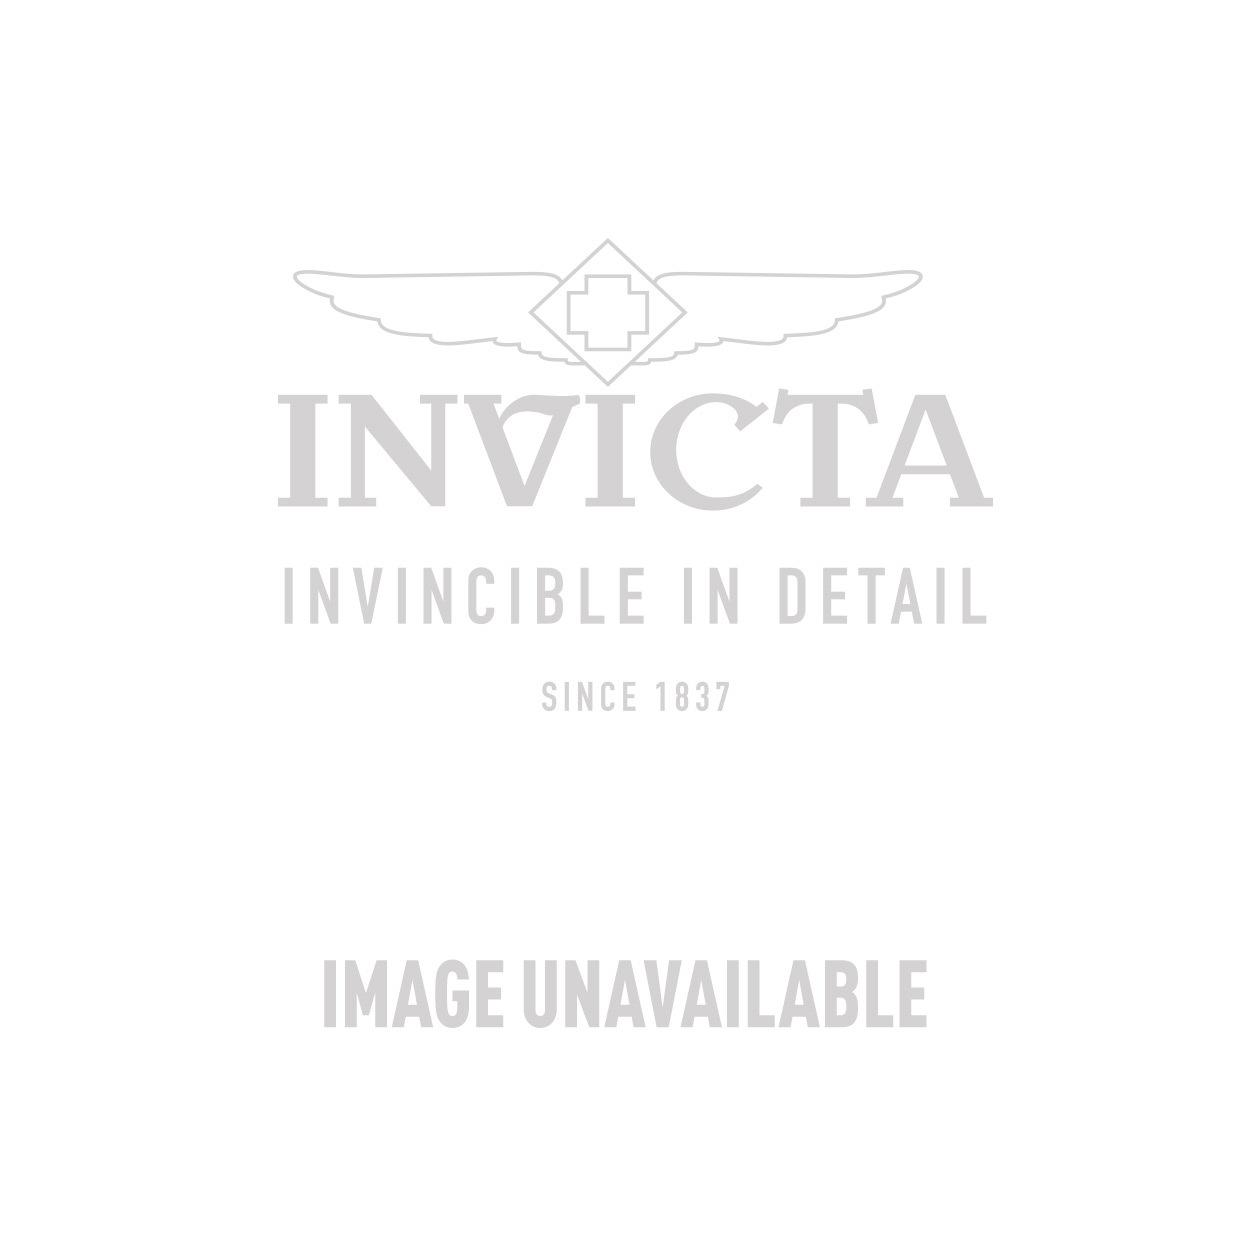 Invicta Bolt Watches | Invicta Stores | FREE Shipping over $99